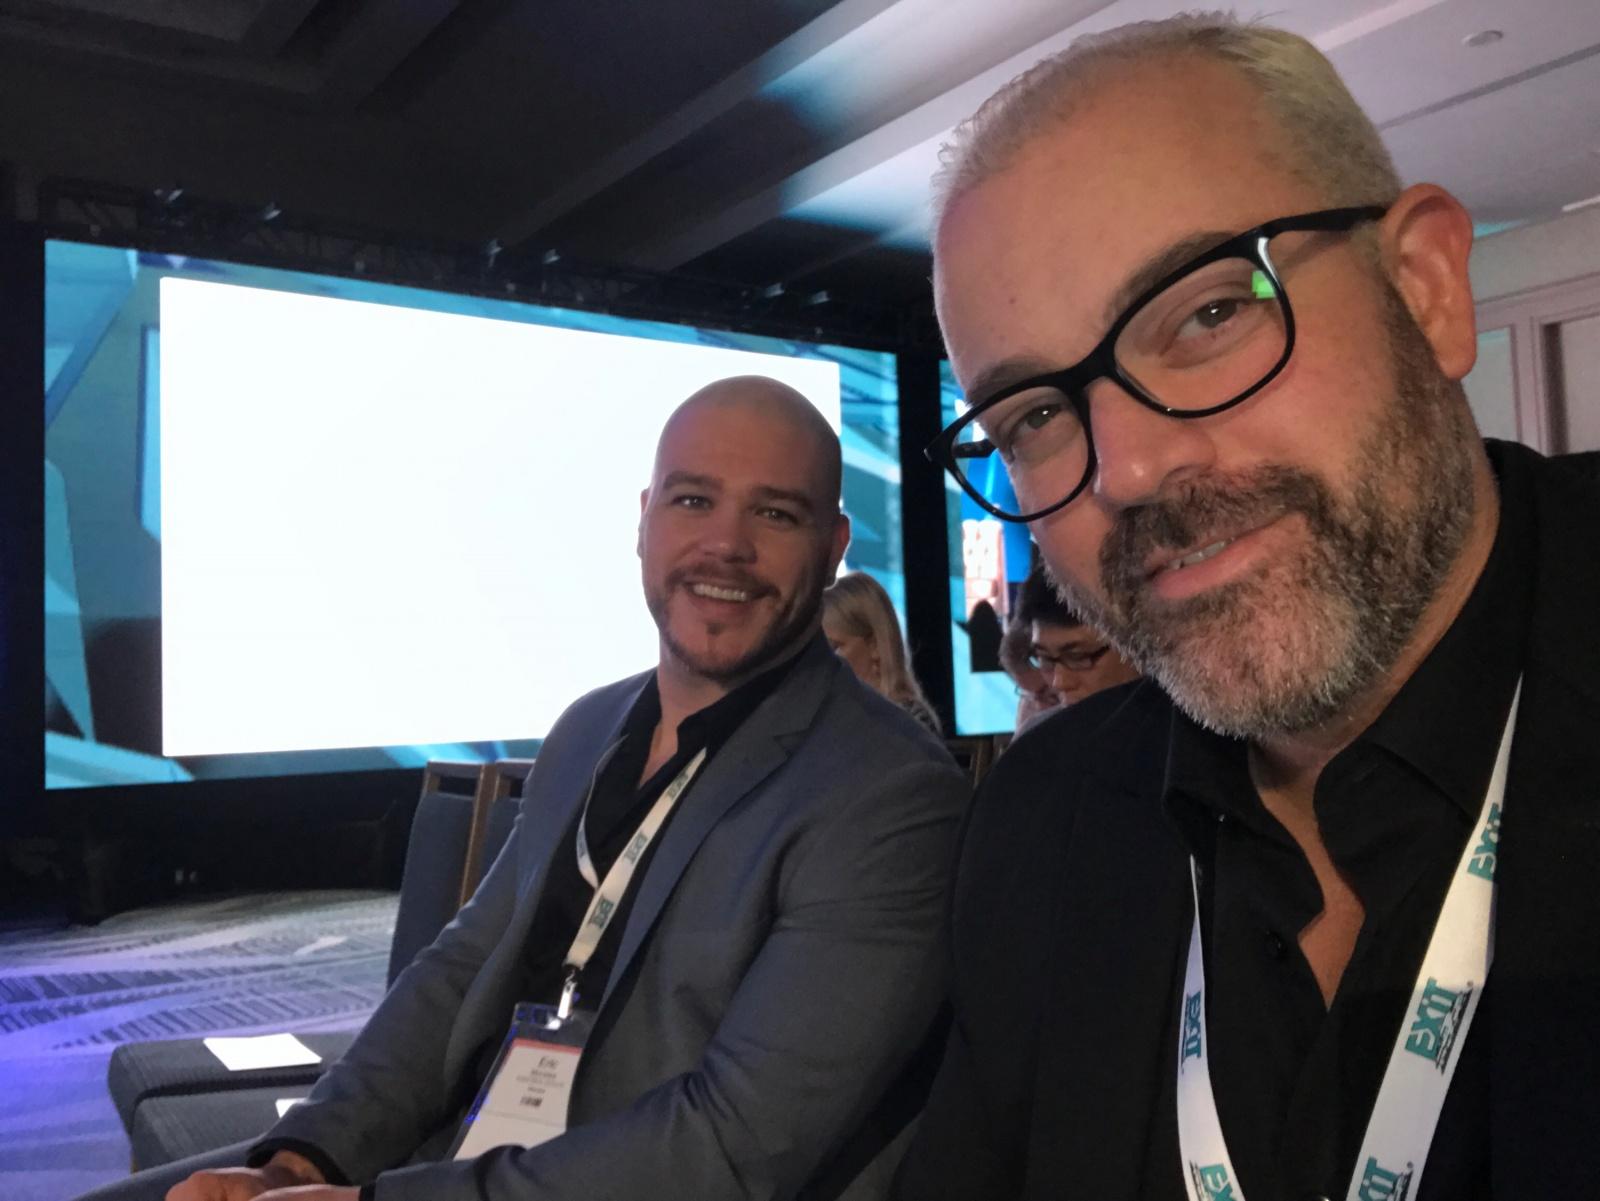 Eric Morales and David Kurz